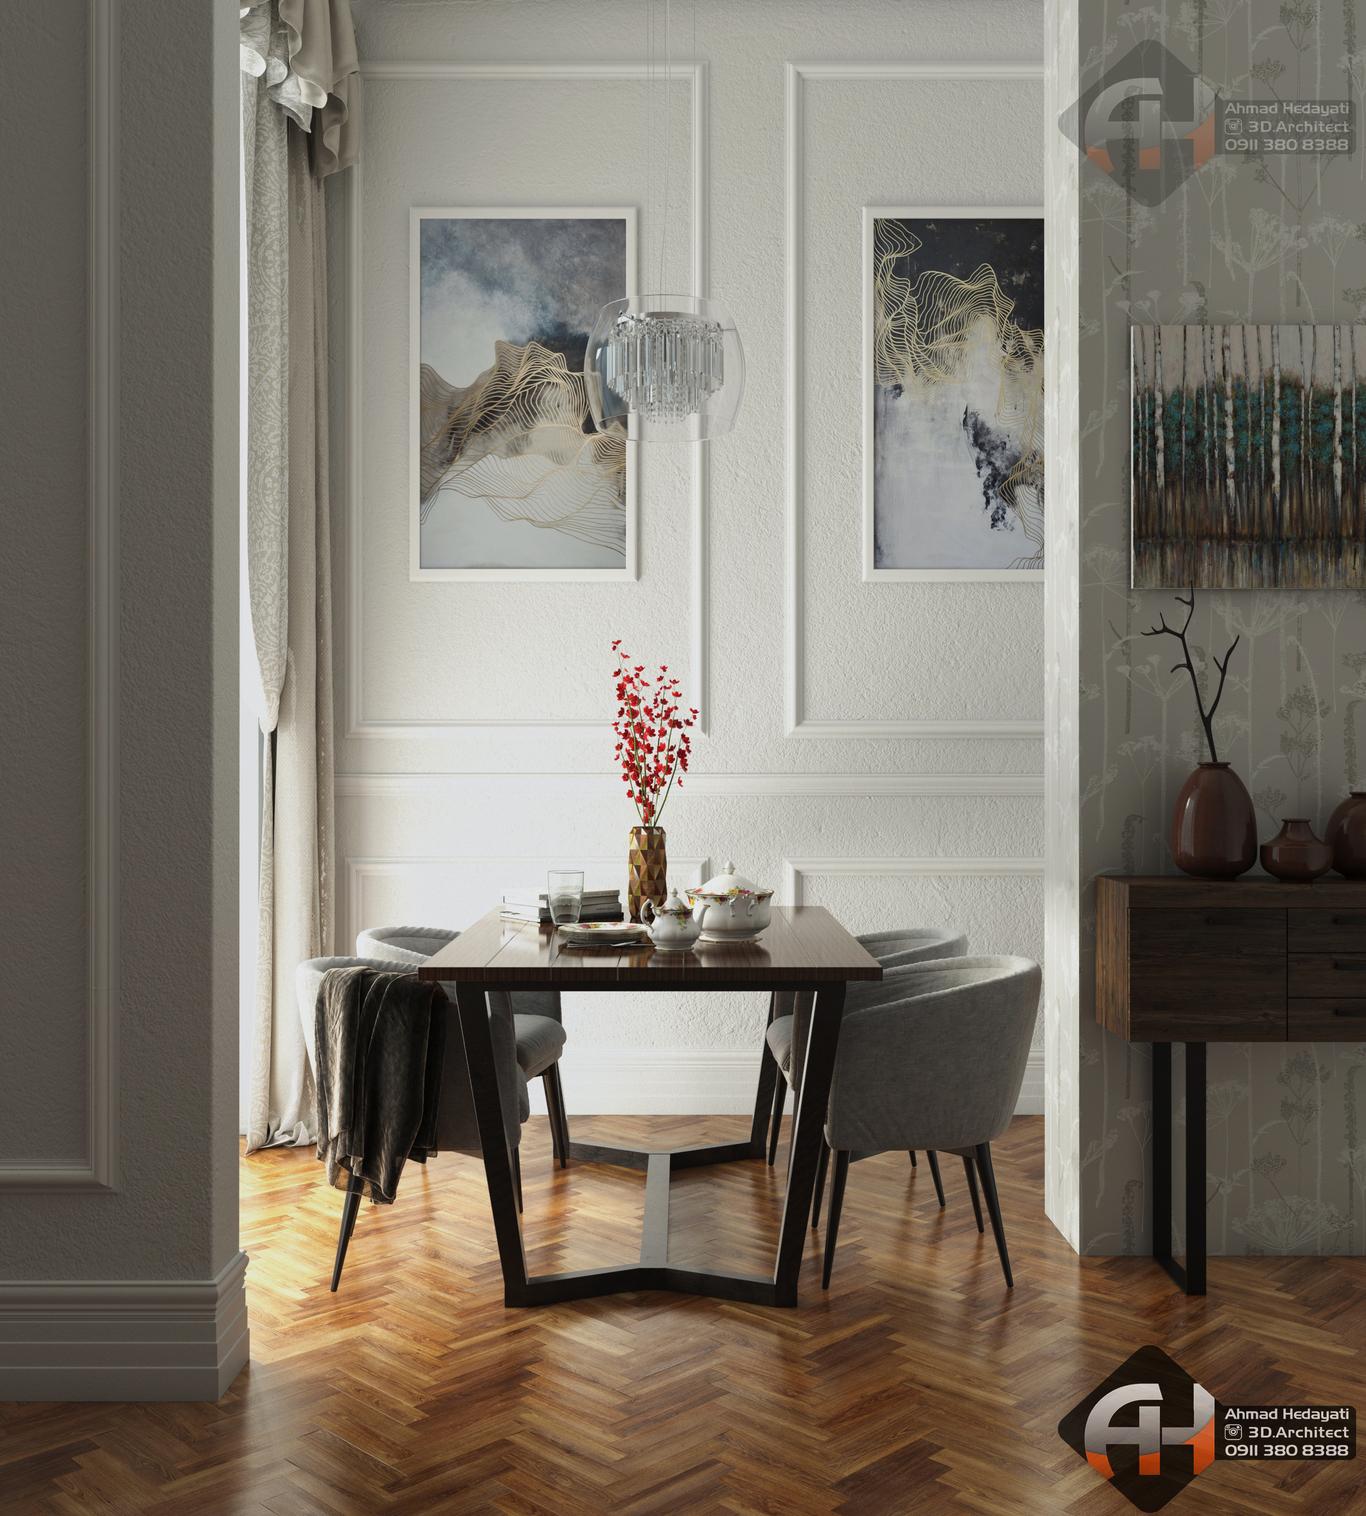 Archixx lovely dining room 1 a8deb827 3071